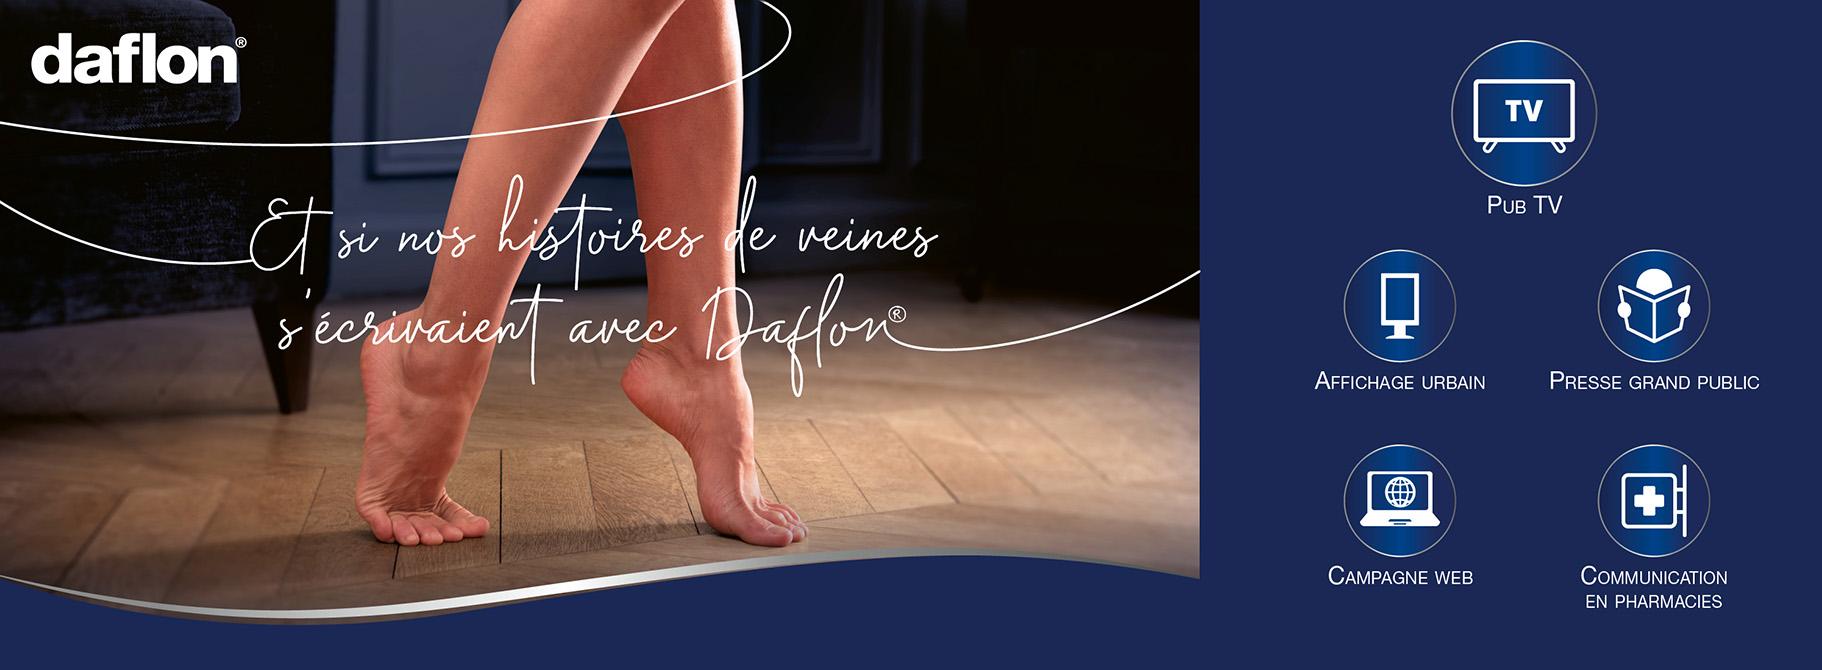 agence-communication-sante-by-agency-daflon-campagne-tv